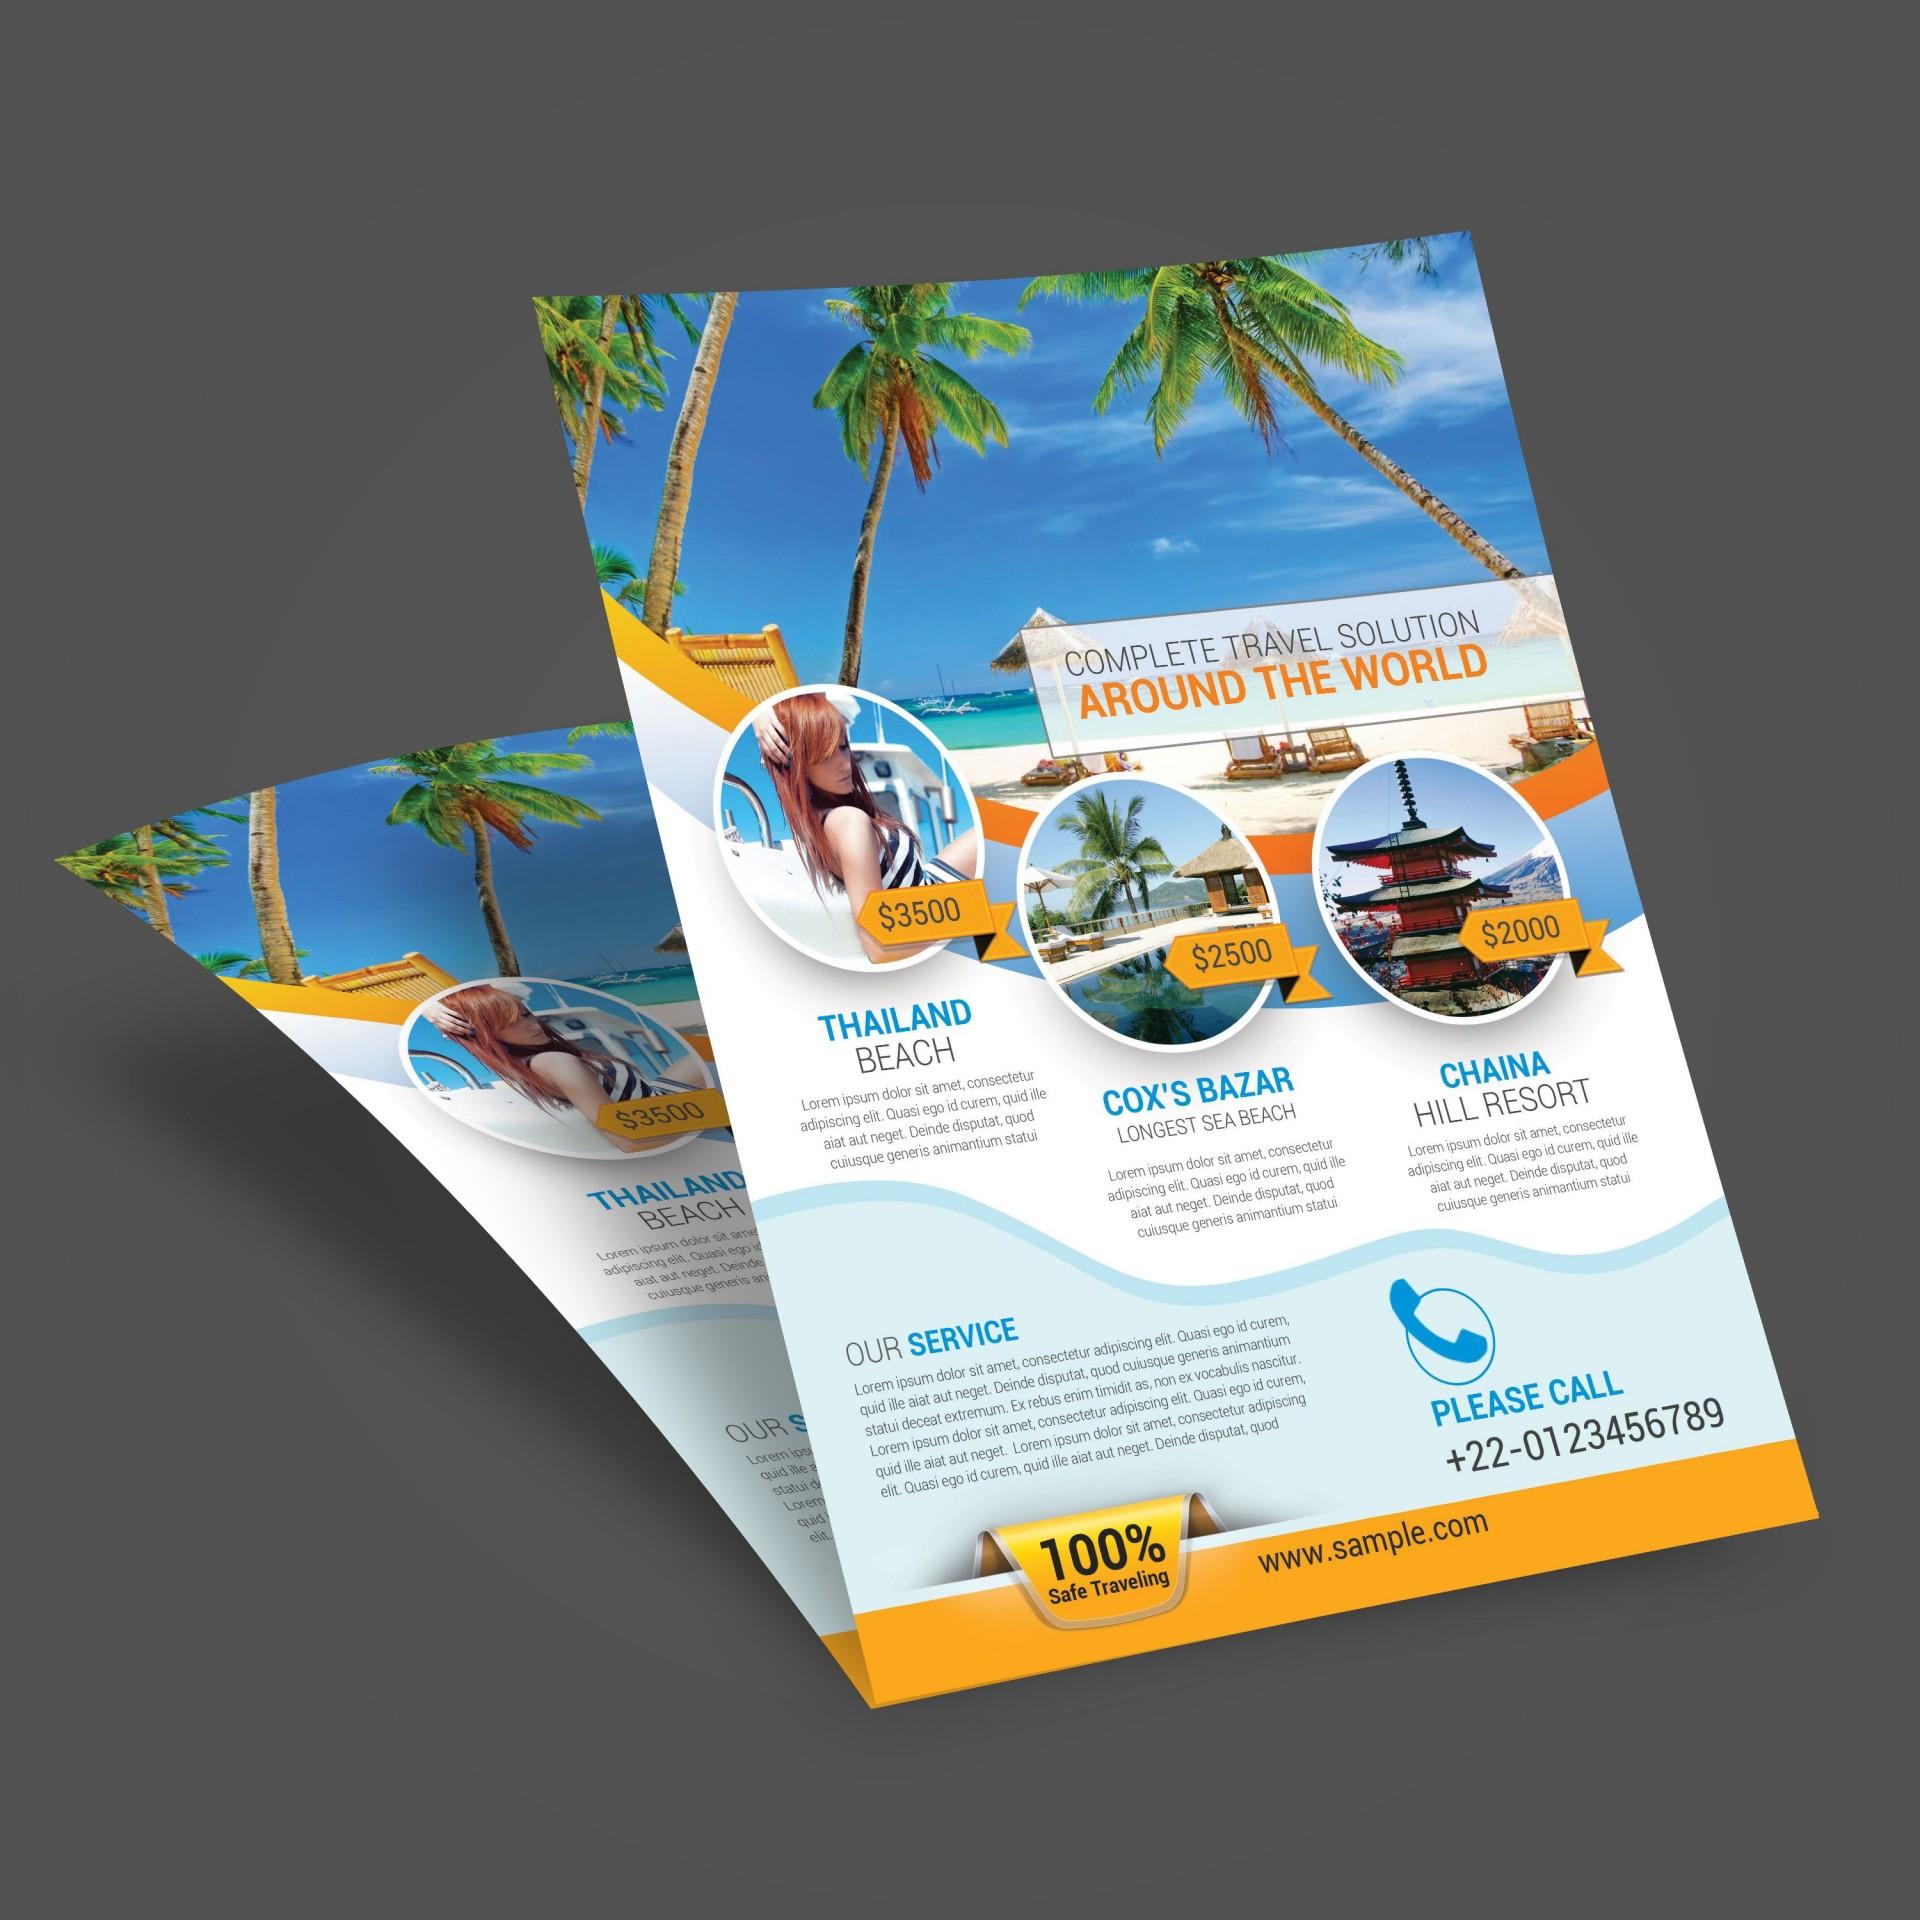 007 Wondrou Free Travel Flyer Template Download Concept 1920